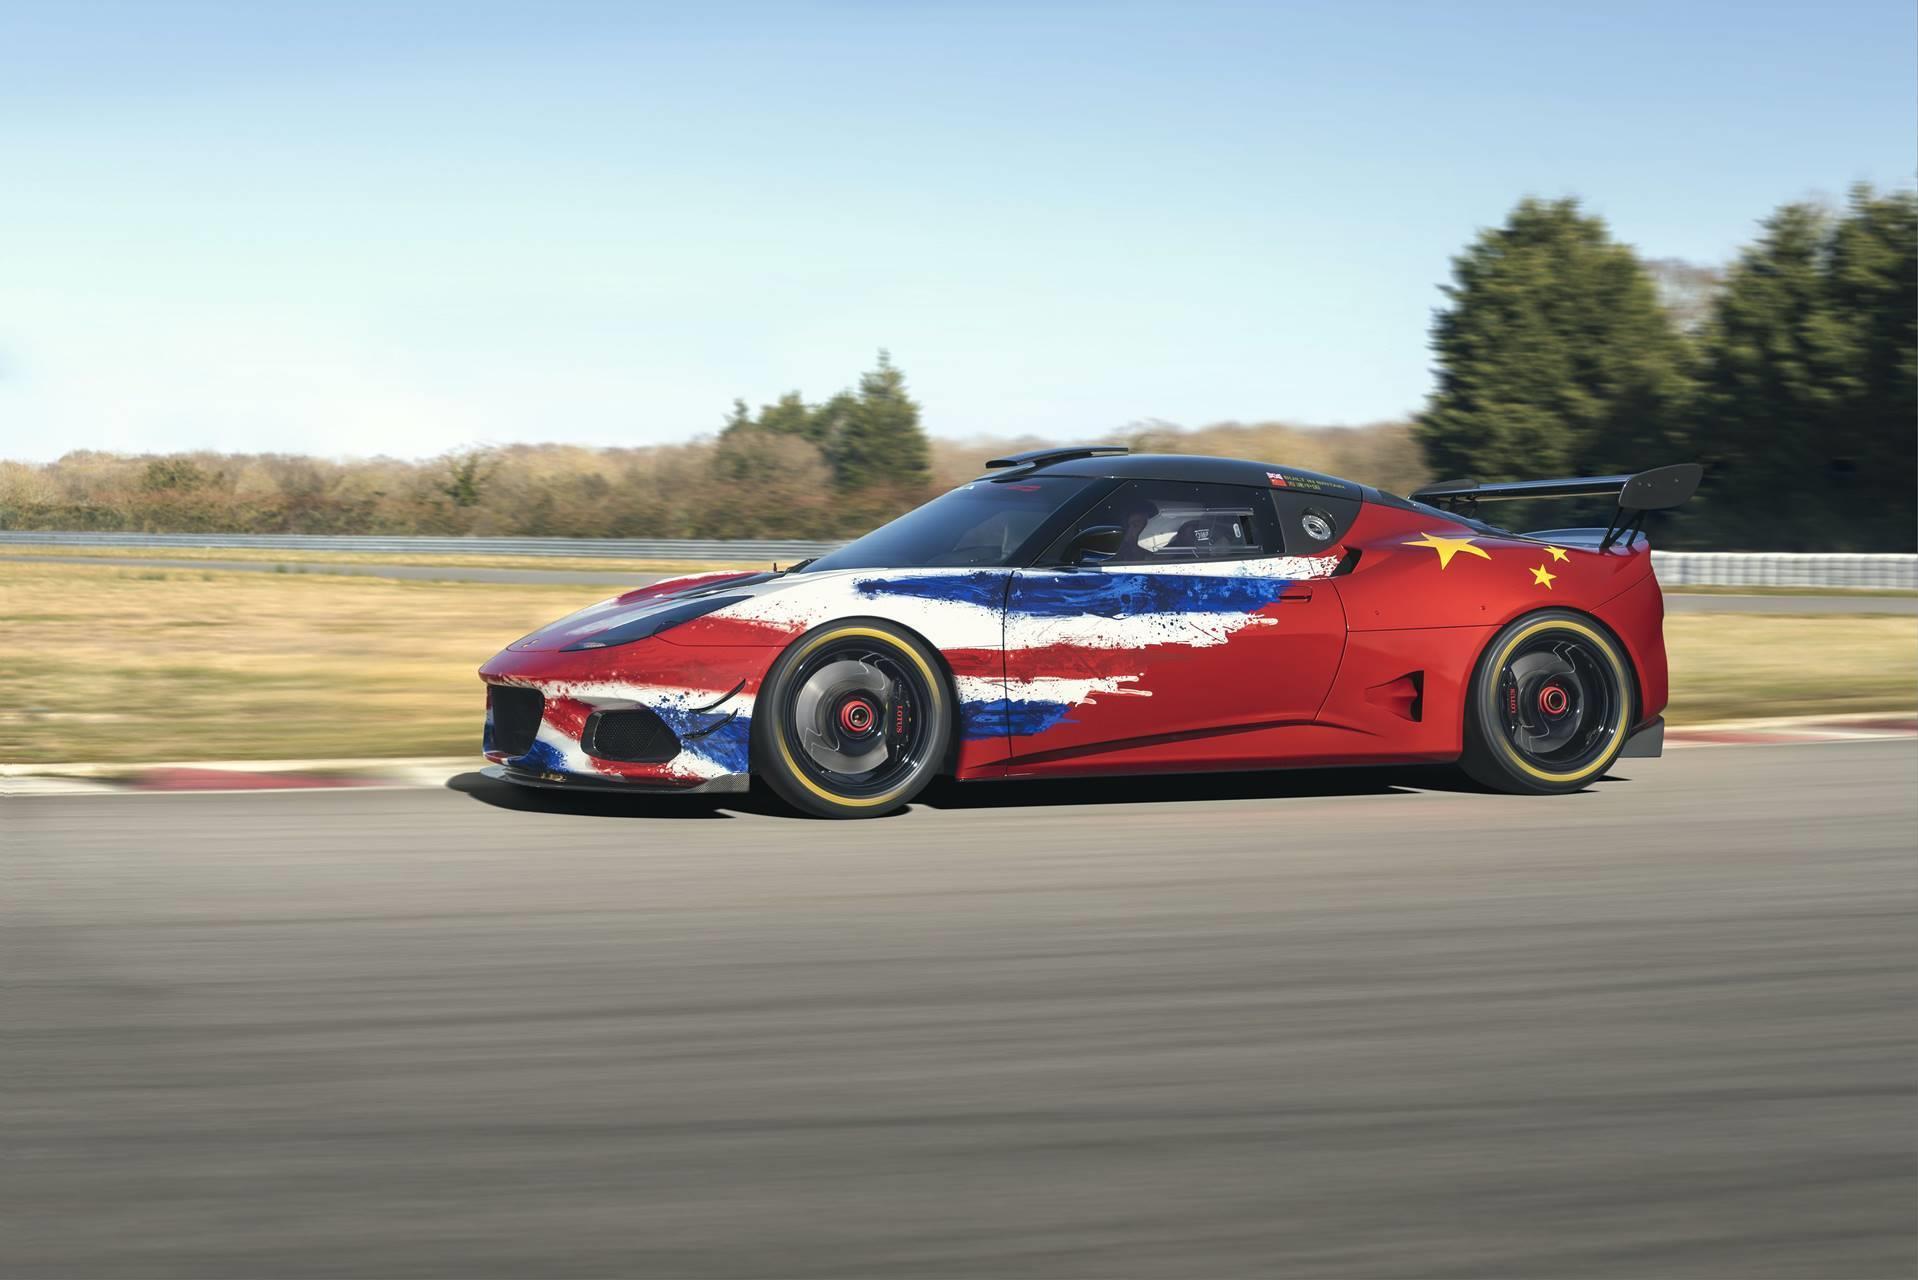 2019 Lotus Evora GT4  Concept